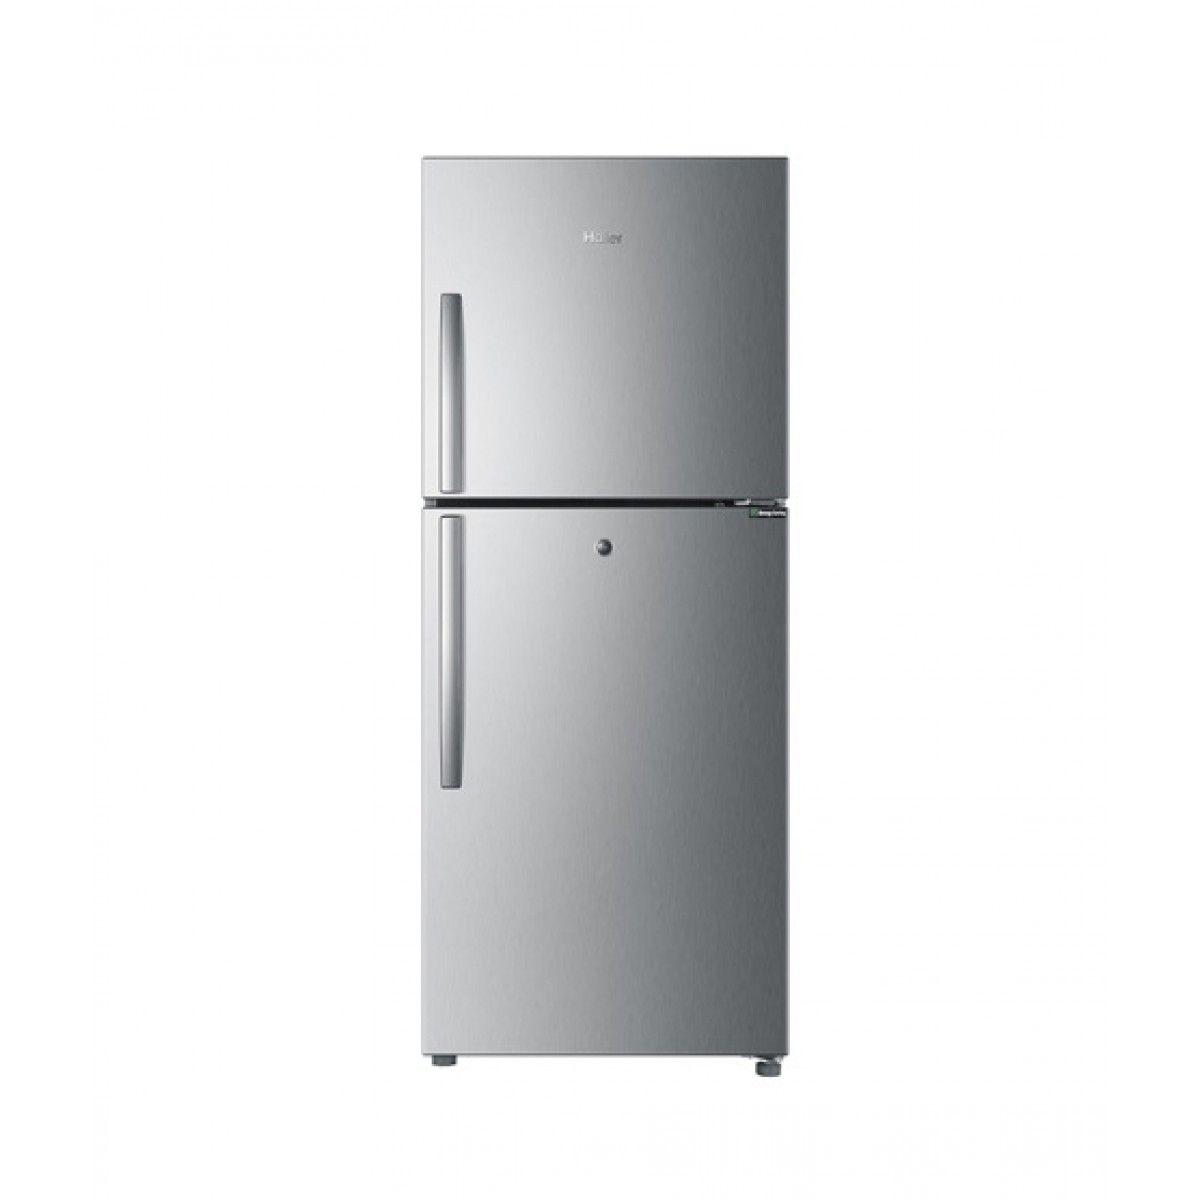 Haier HRF-306ECS 10 Cu Ft Refrigerator